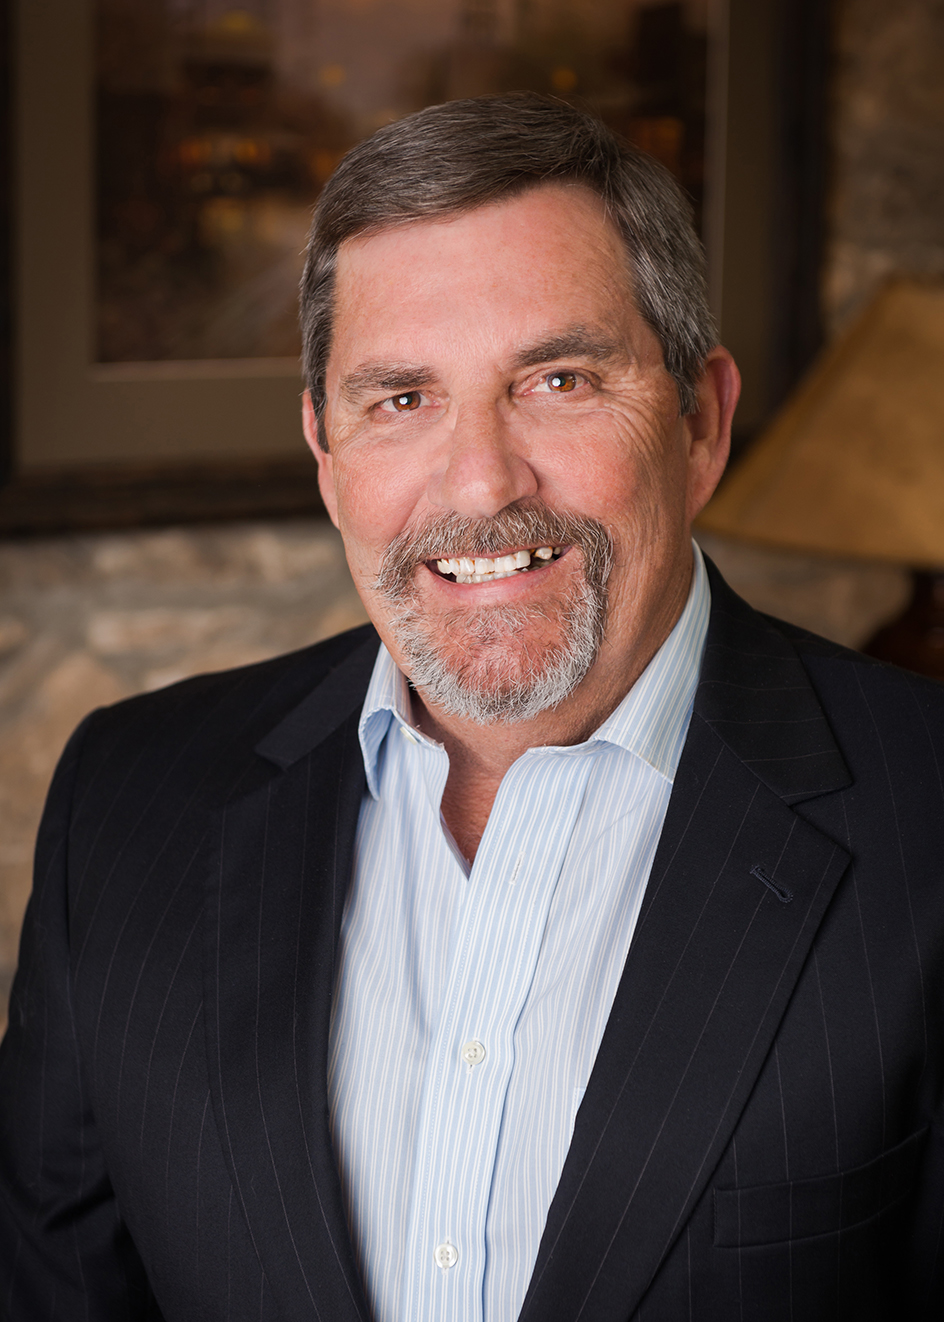 Greg Hufstetler